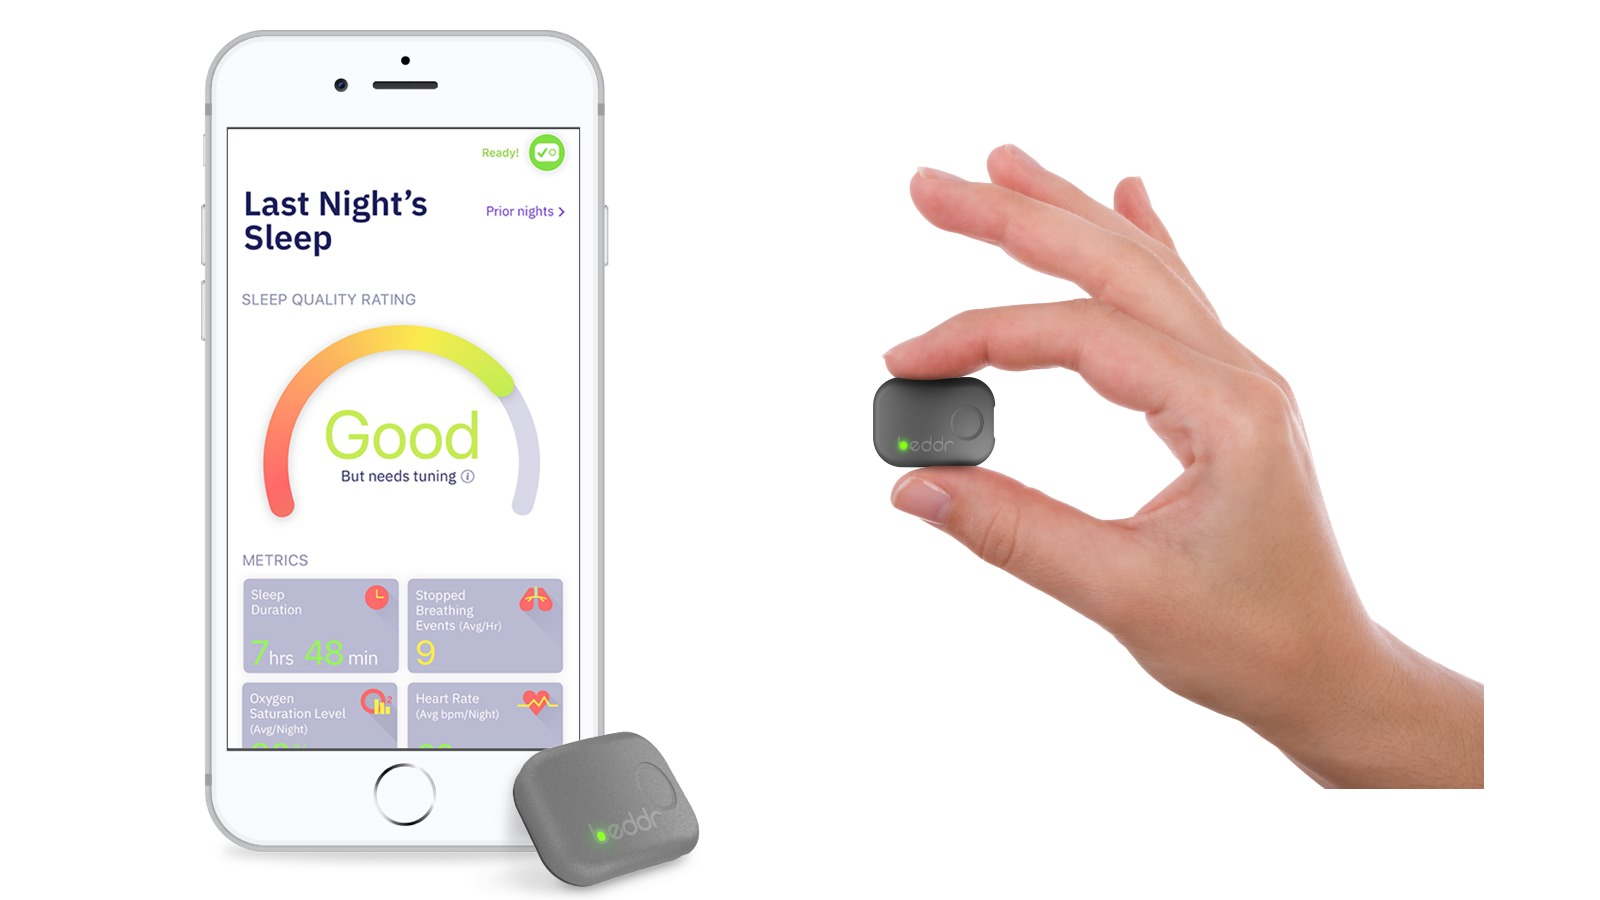 Beddr's SleepTuner is a Powerful Standalone Alternative to Apple Watch Sleep Tracking